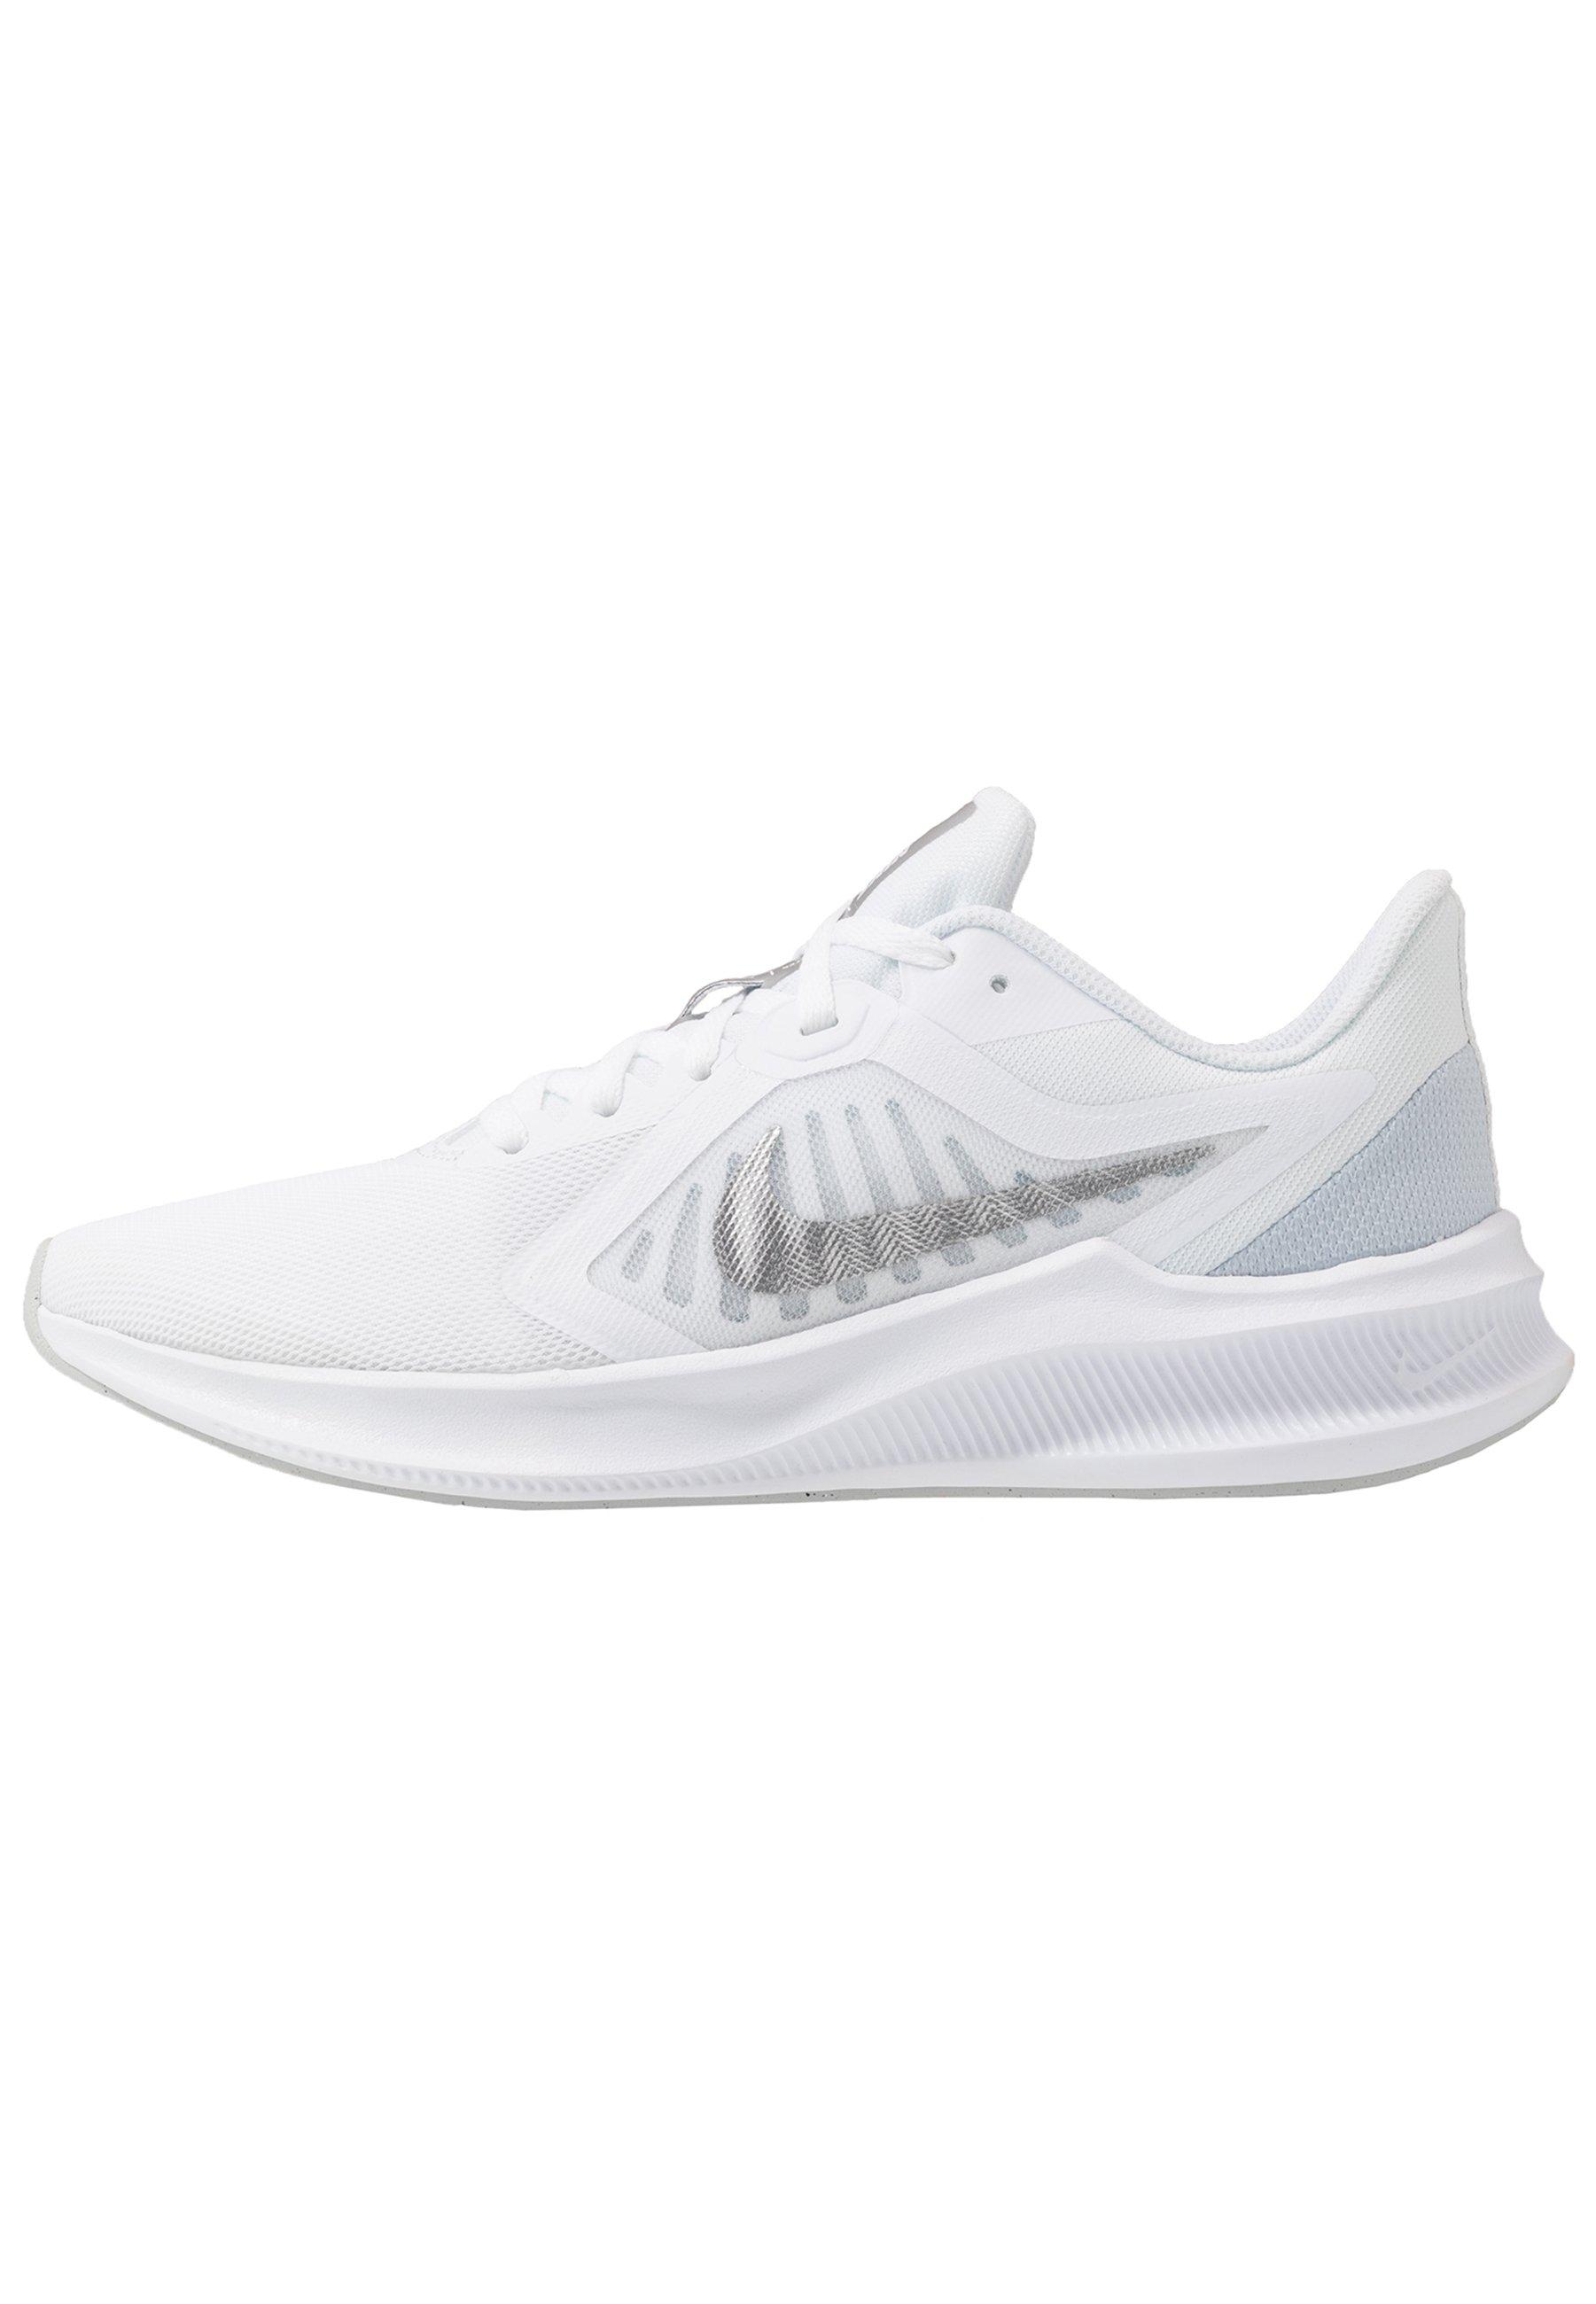 Nike Performance Downshifter 10 - Scarpe Running Neutre White/metallic Silver/pure Platinum 9OZZO